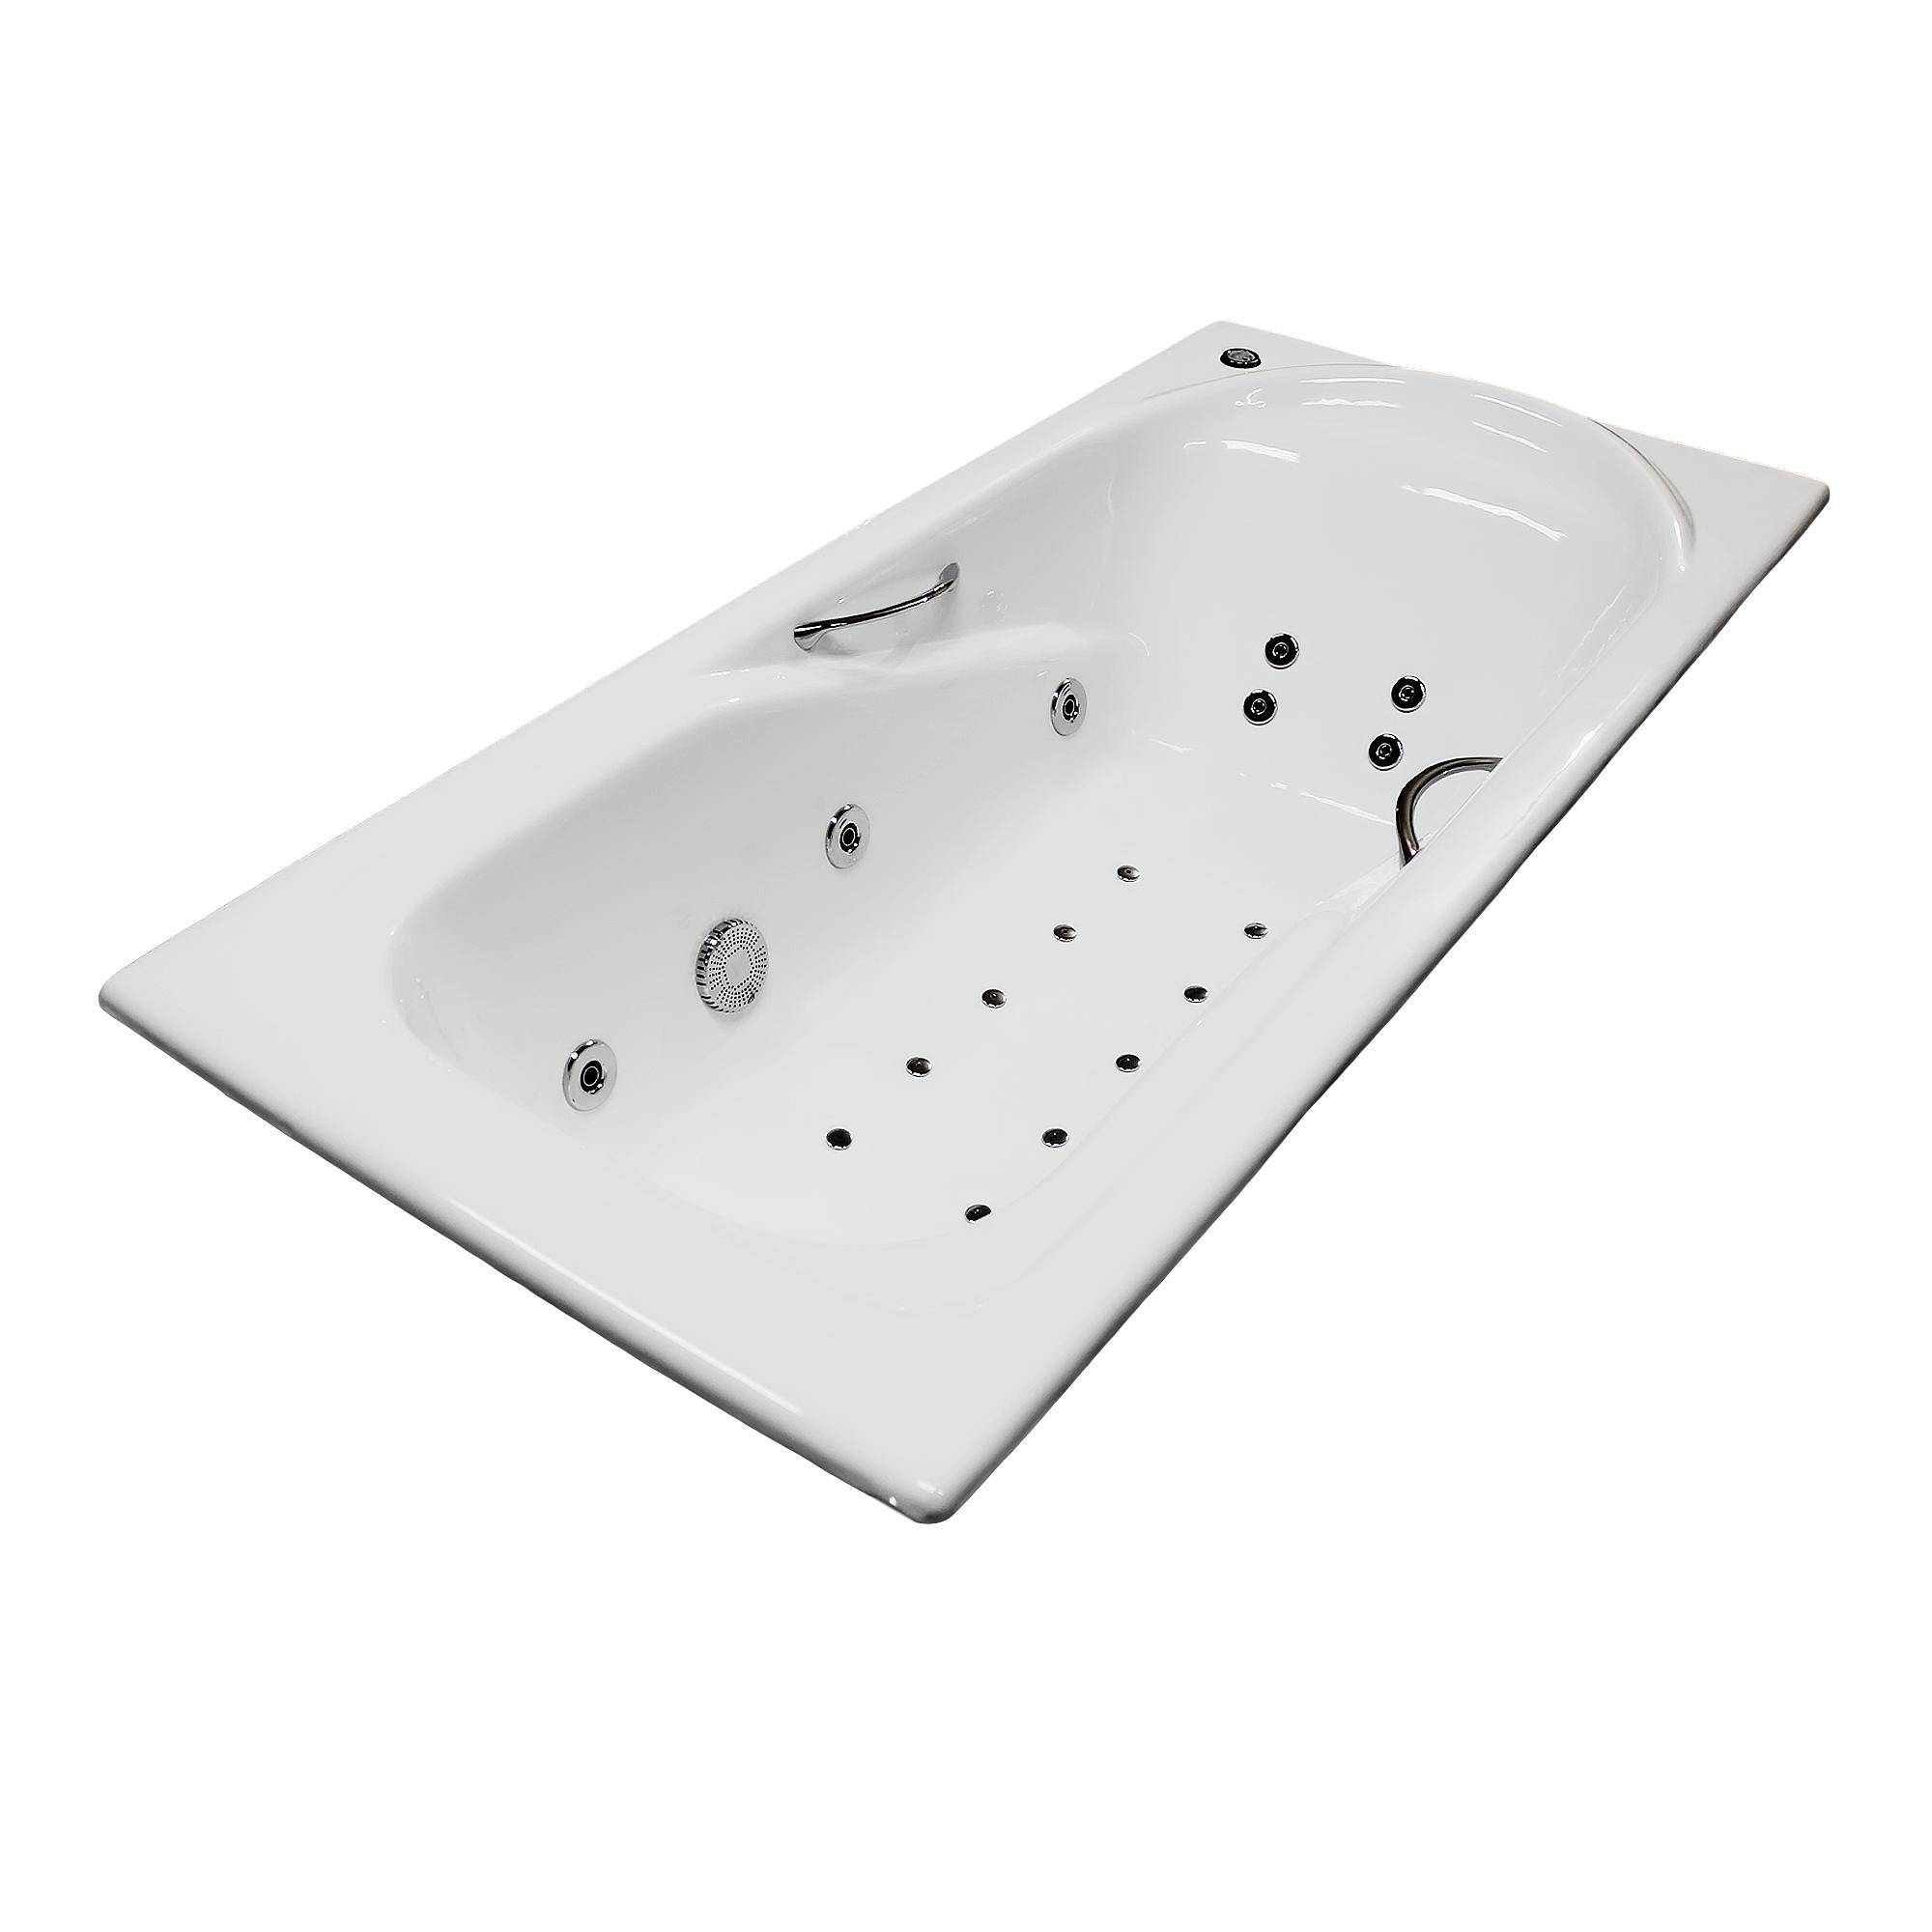 Ванна Artex Adag 170x80